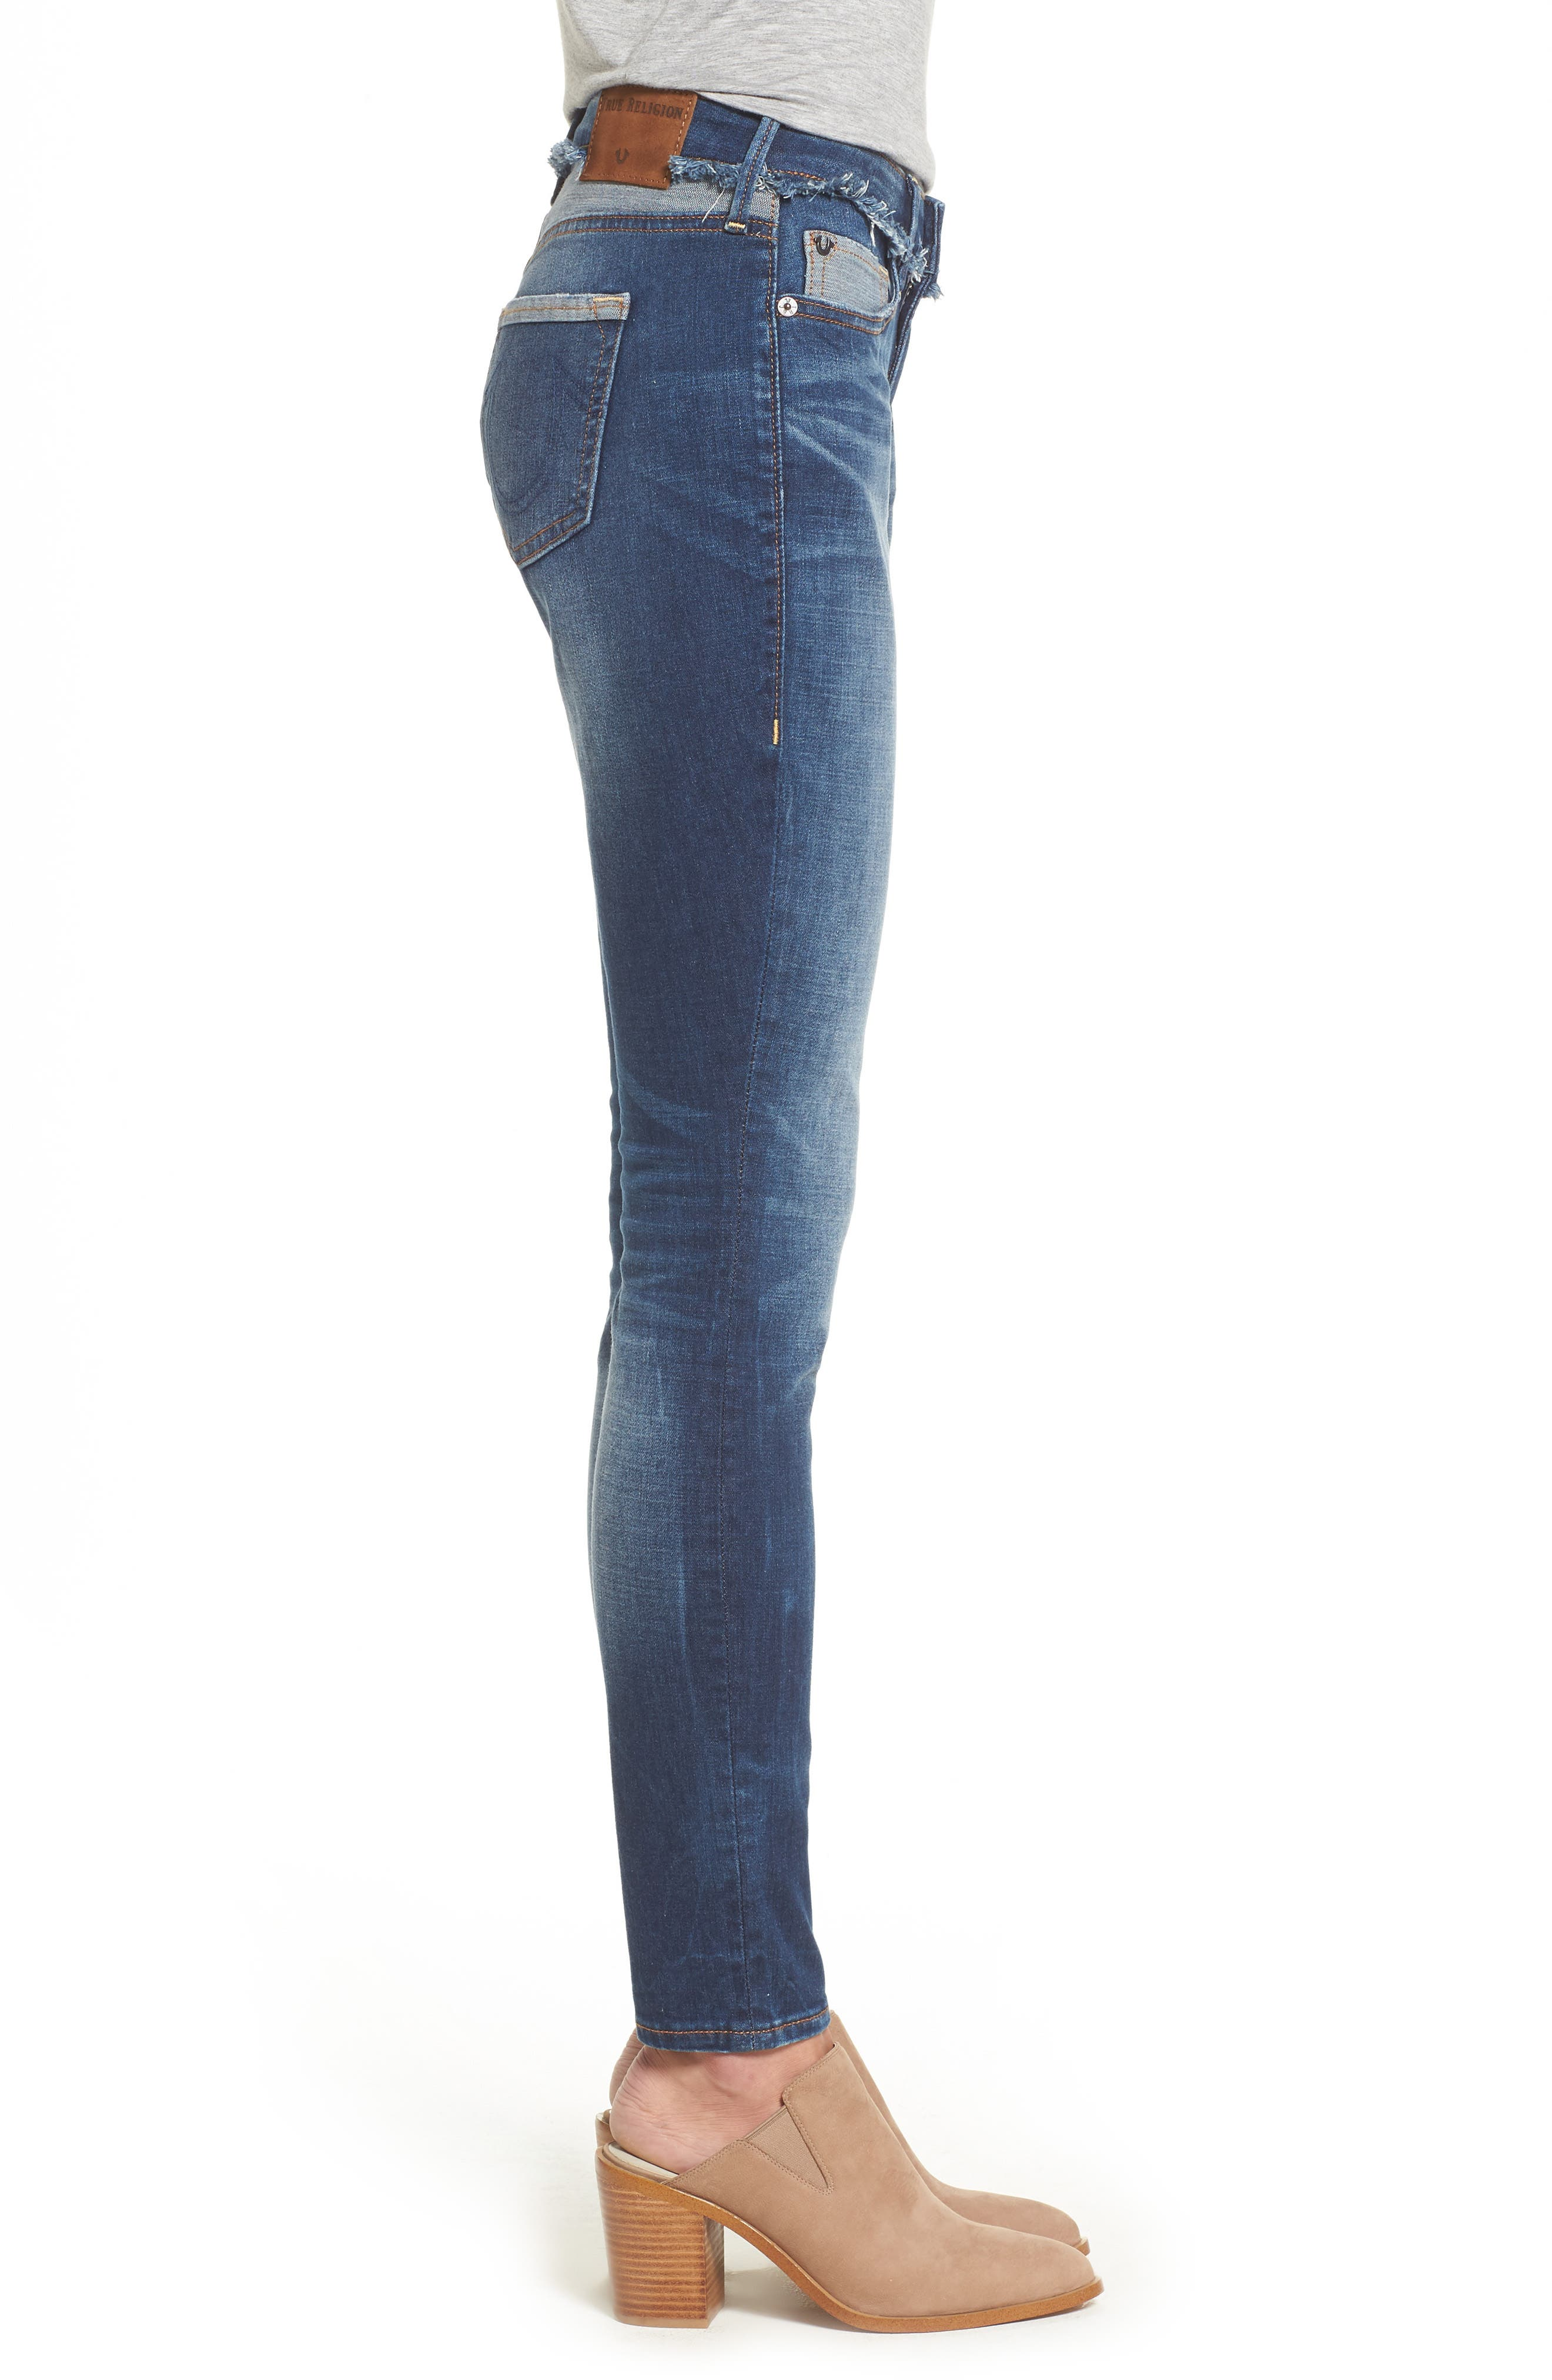 Alternate Image 3  - True Religion Brand Jeans Jennie Deconstructed Skinny Jeans (Broken Record)